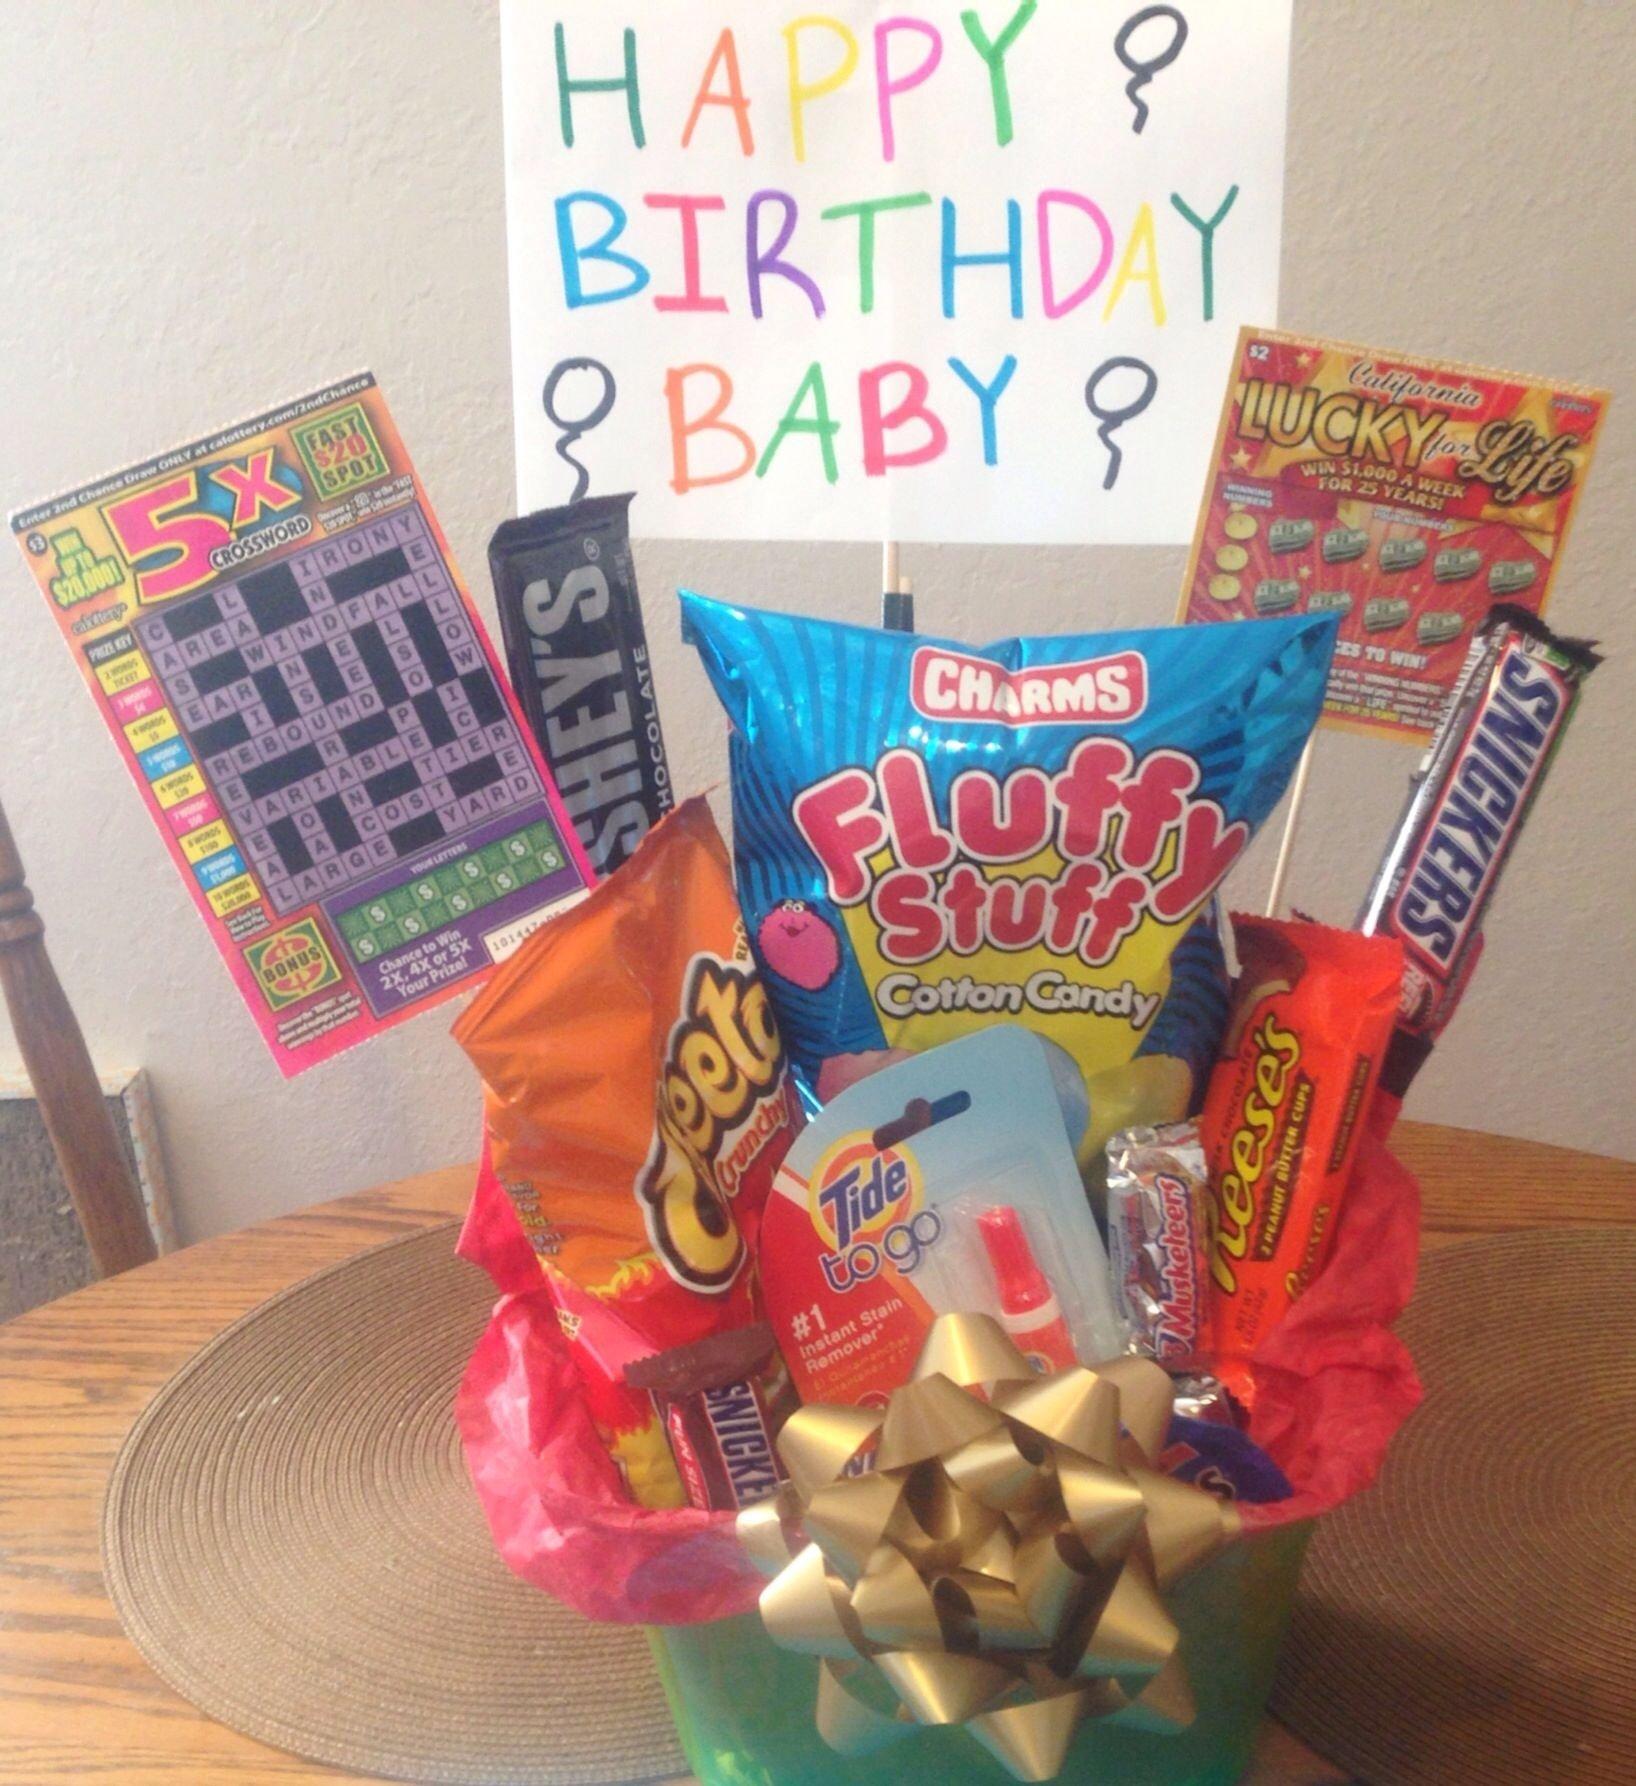 10 Stunning Birthday Ideas For My Boyfriend for my boyfriends 22nd birthday my projects pinterest 22 birthday 2 2021